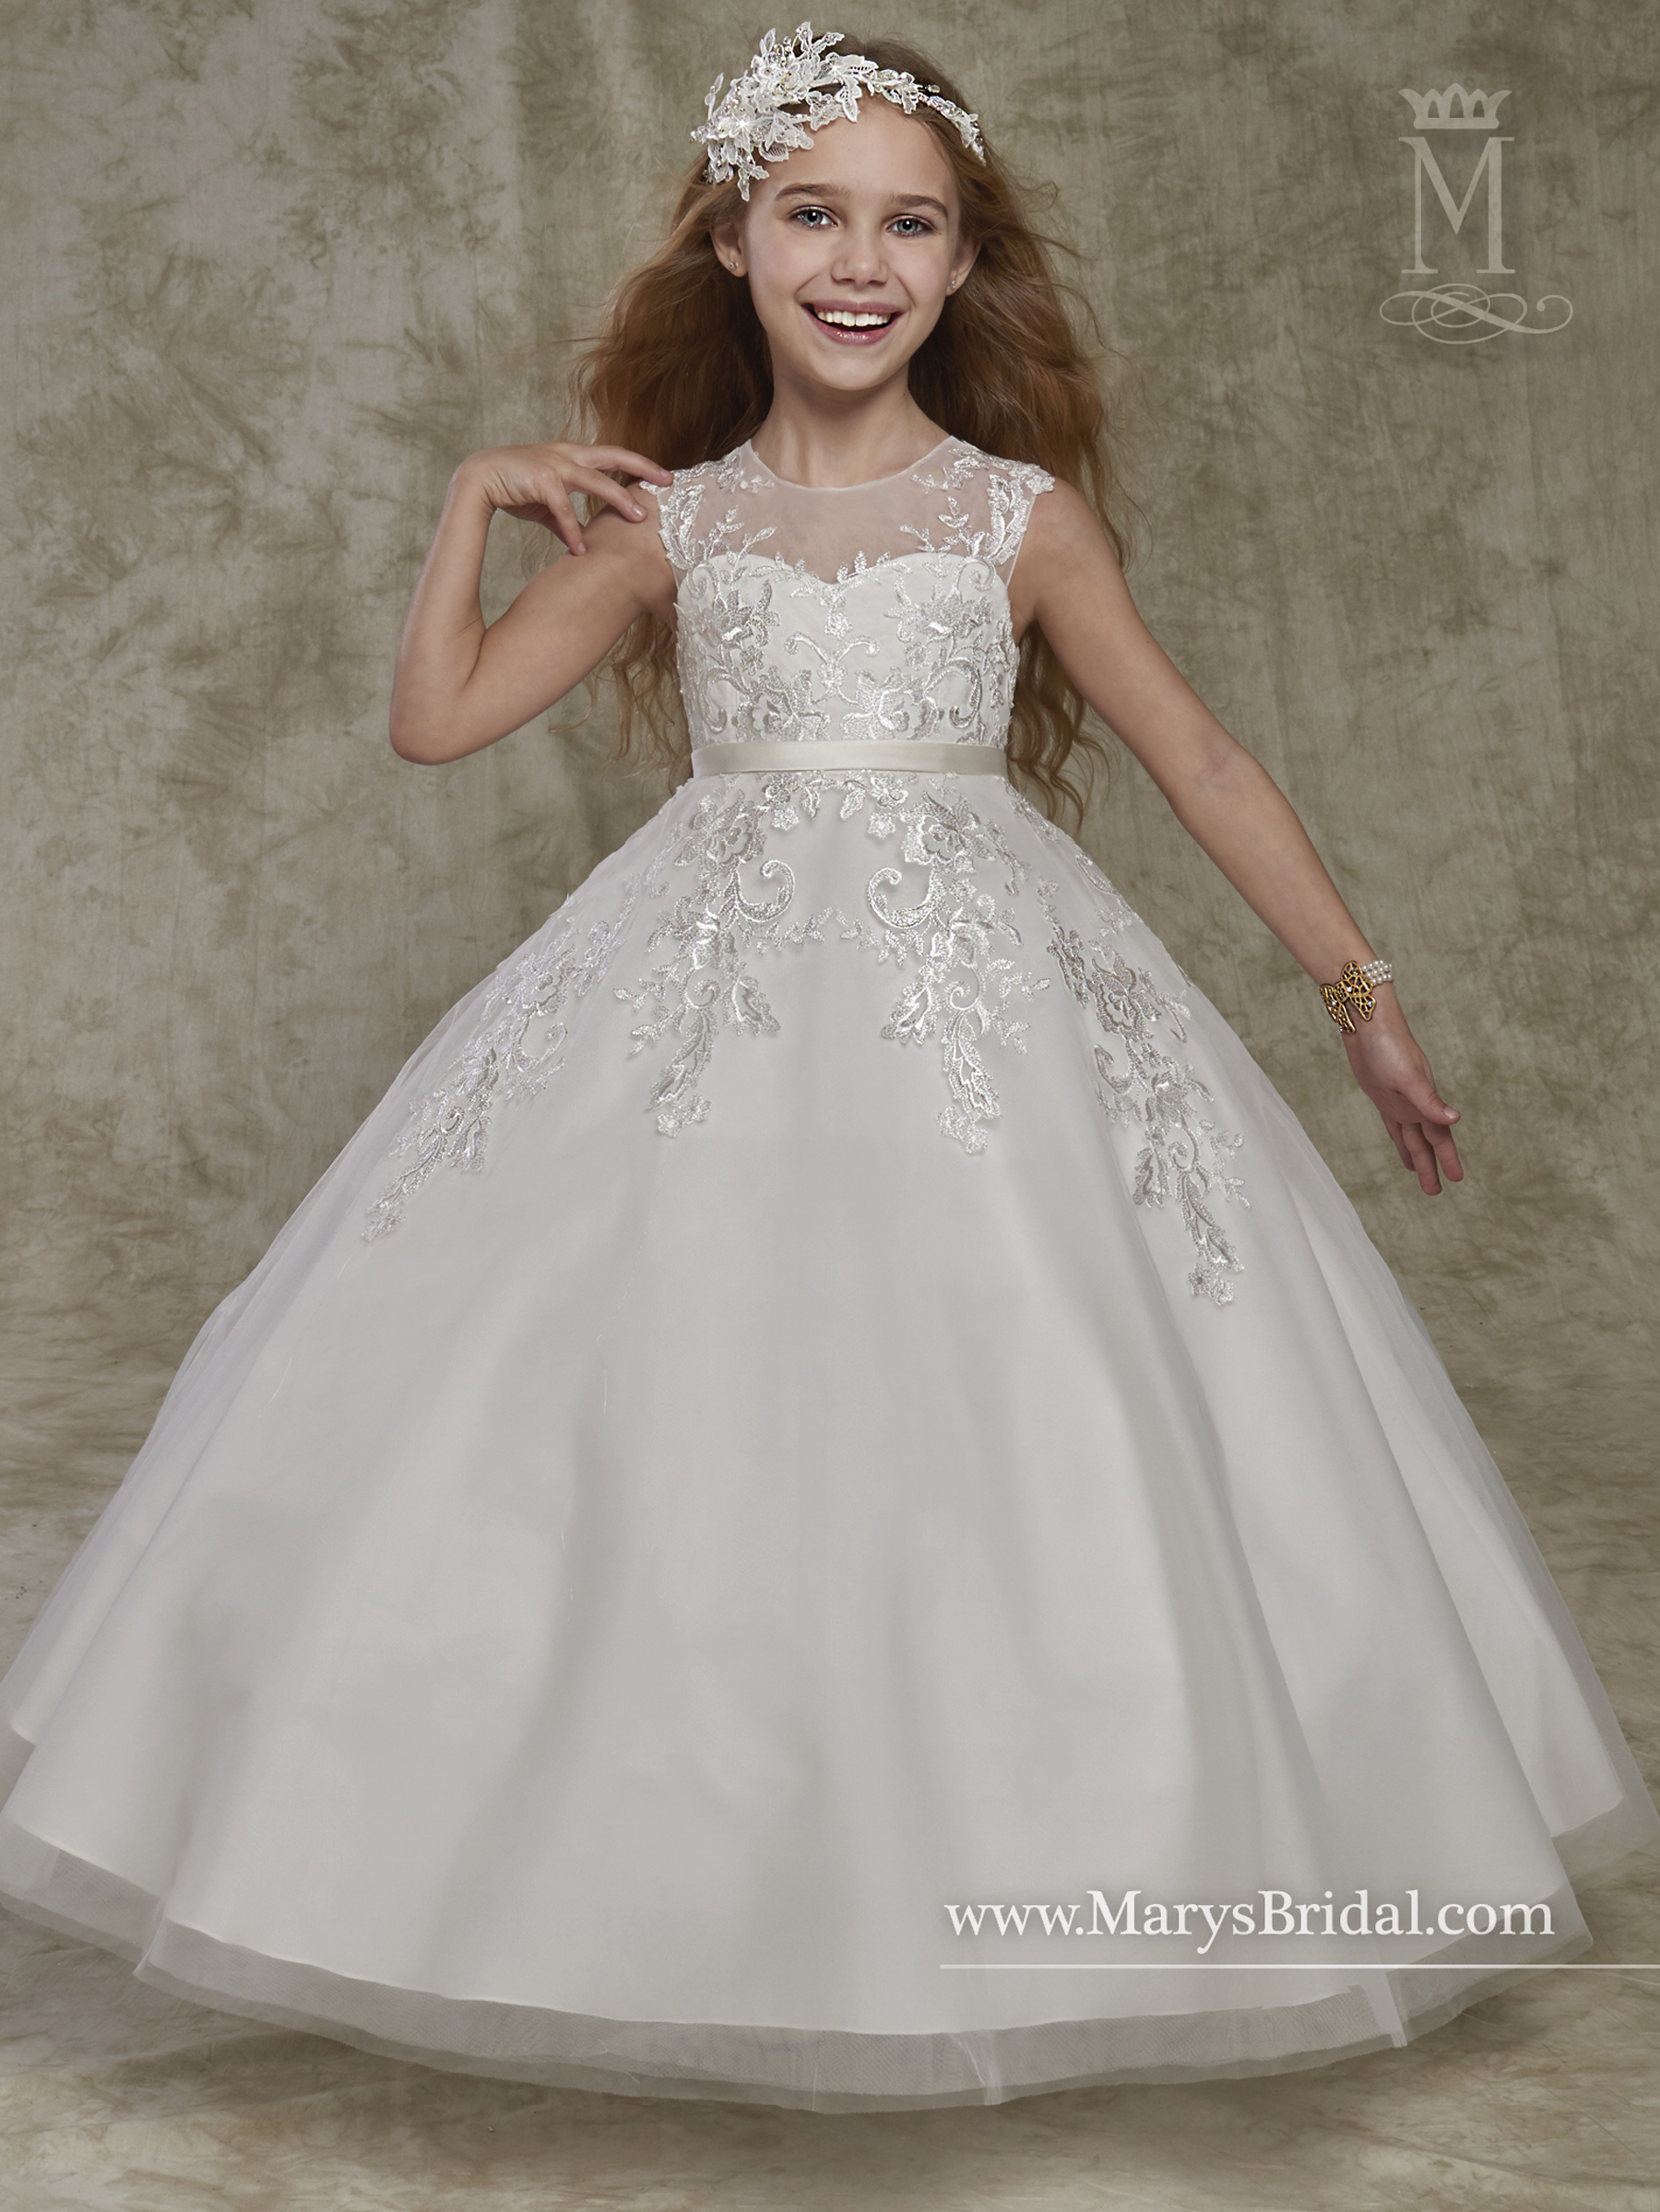 Angel Flower Girl Dresses Style F541 In Ivory Or White